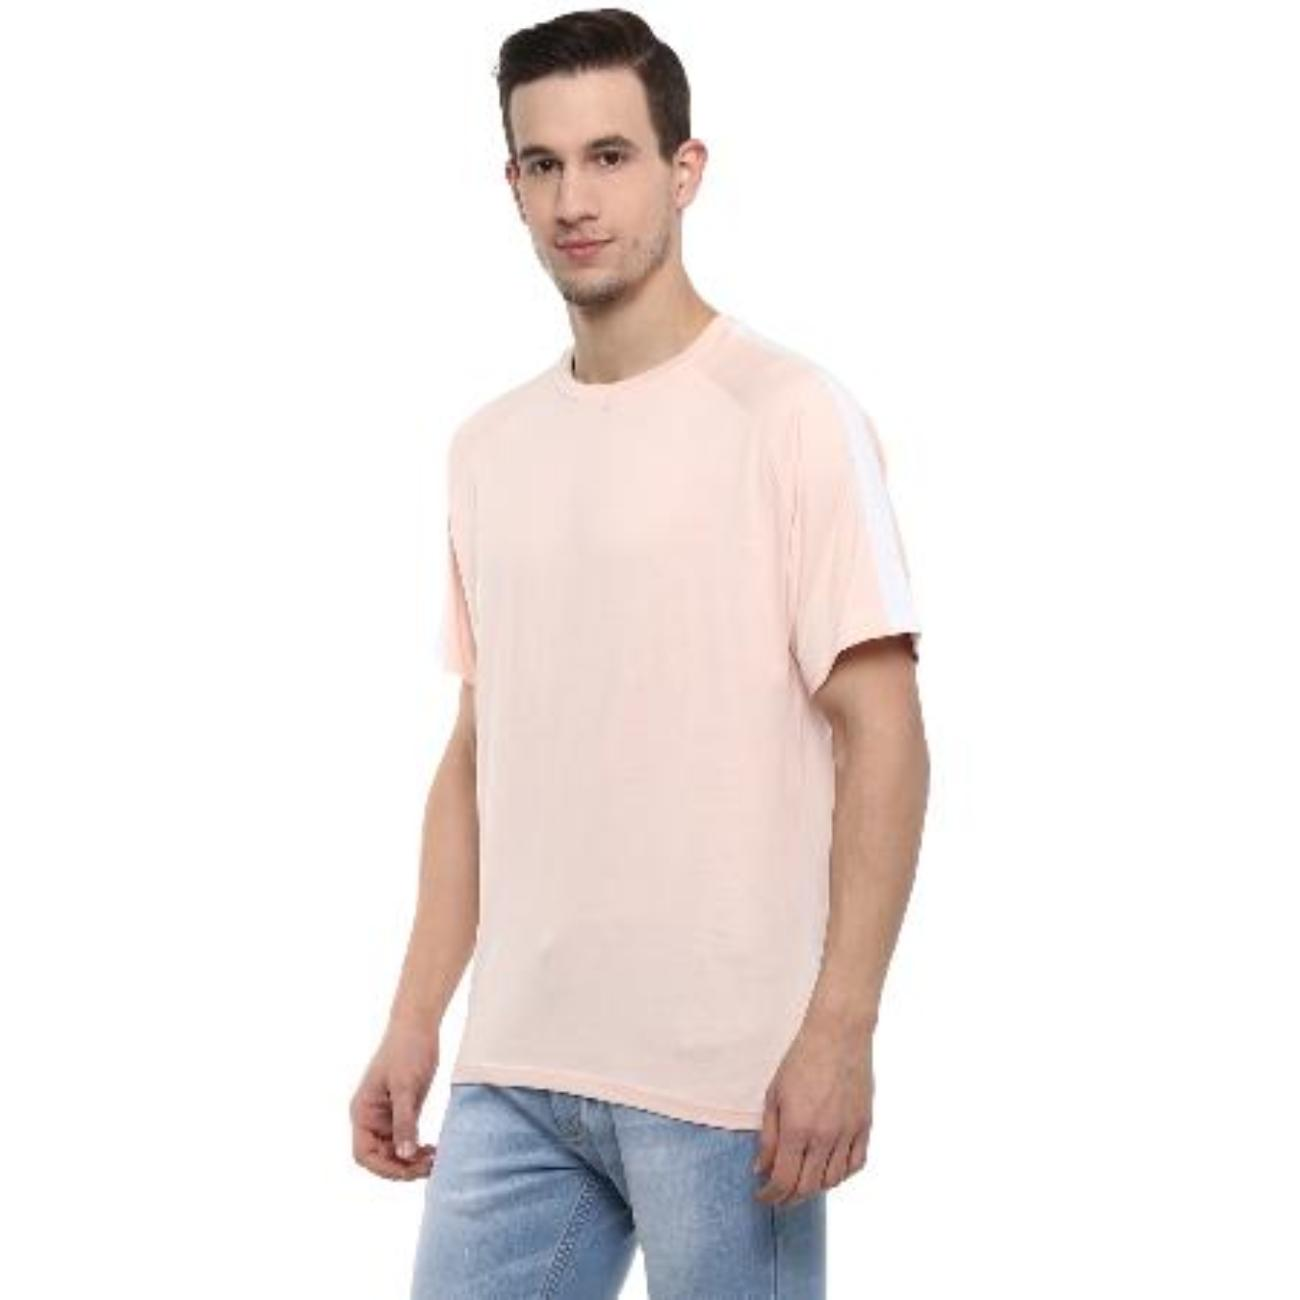 Casual Wear TShirt for Men